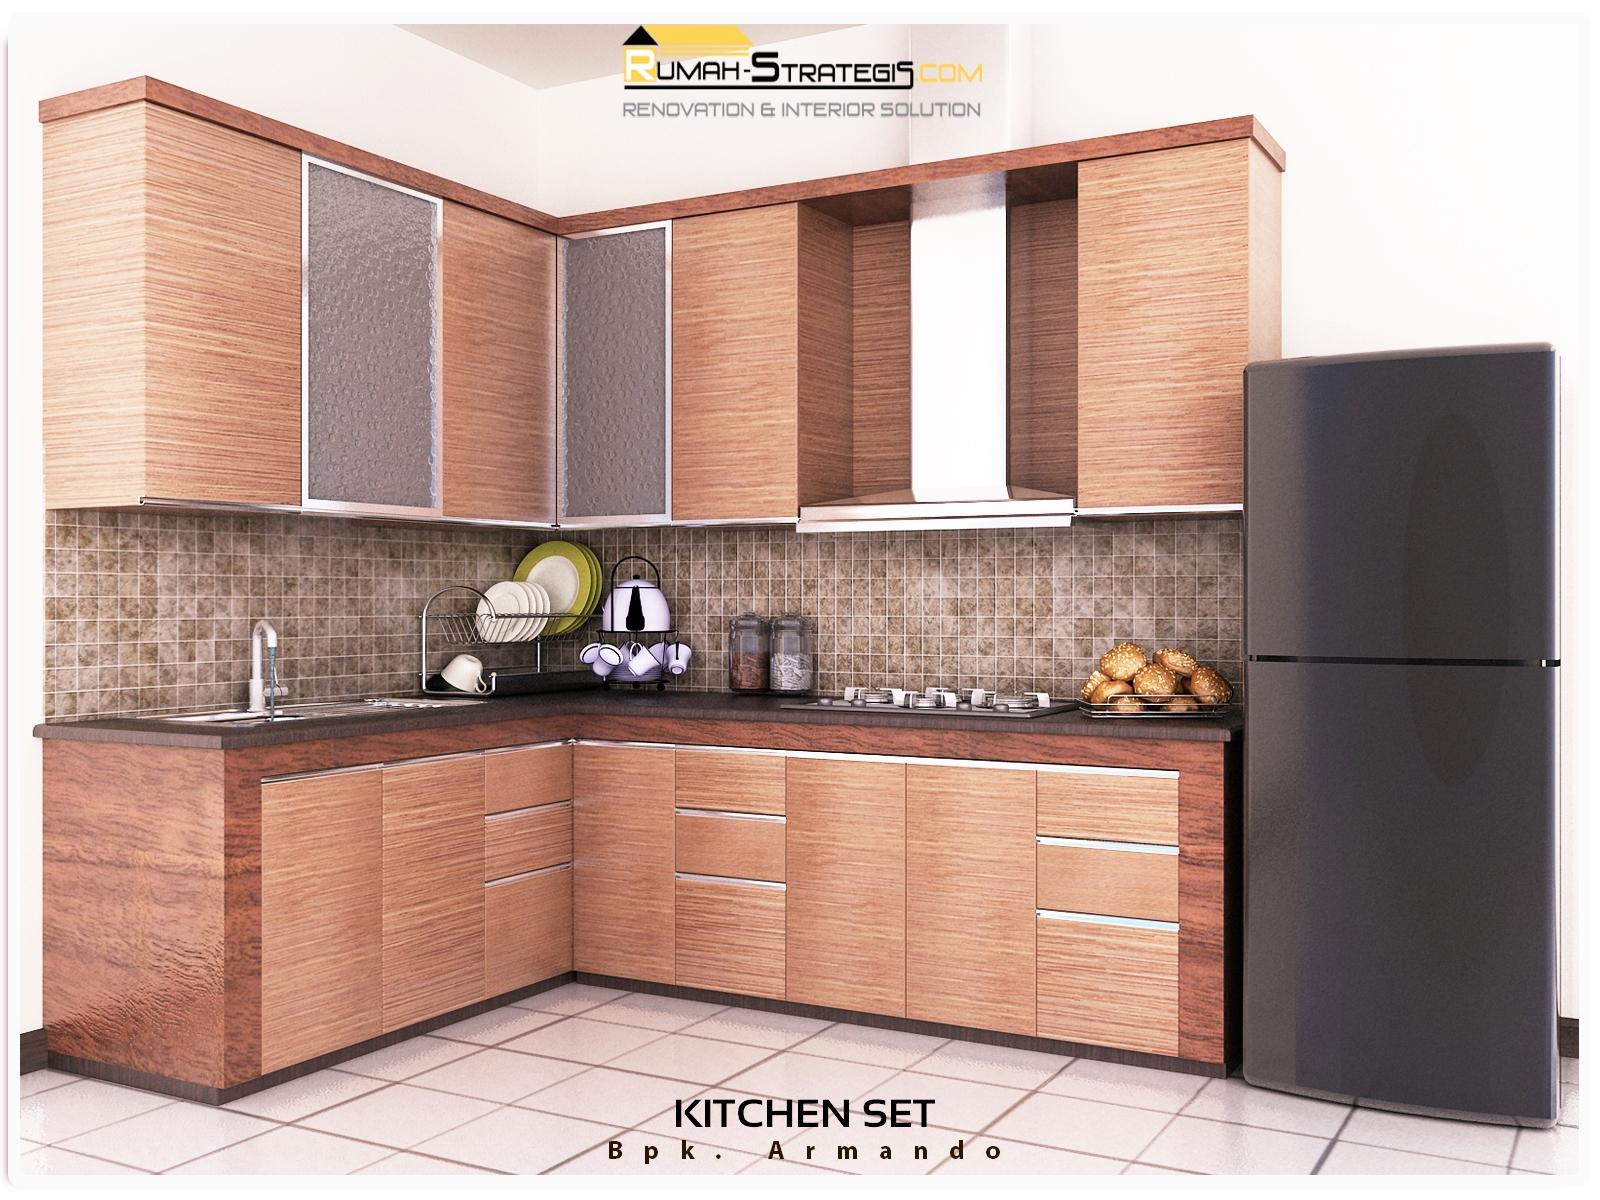 Design Of Drafter Kitchen Set Bpk Armando